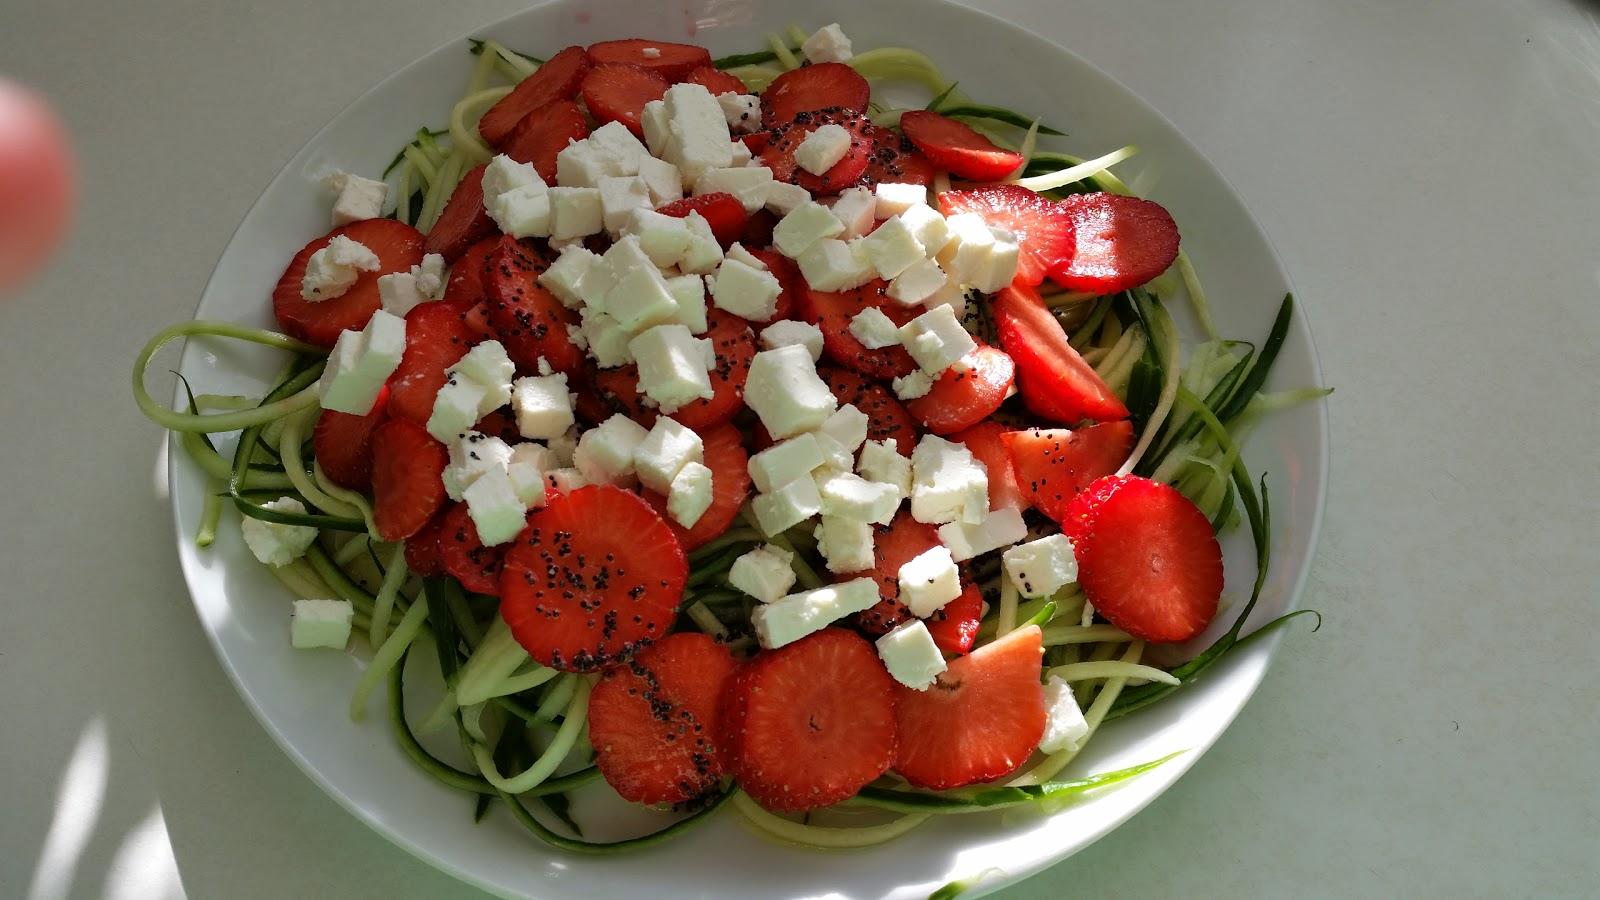 Sundt Og Lækkert Salat Med Agurk Jordbær Og Blå Birkes